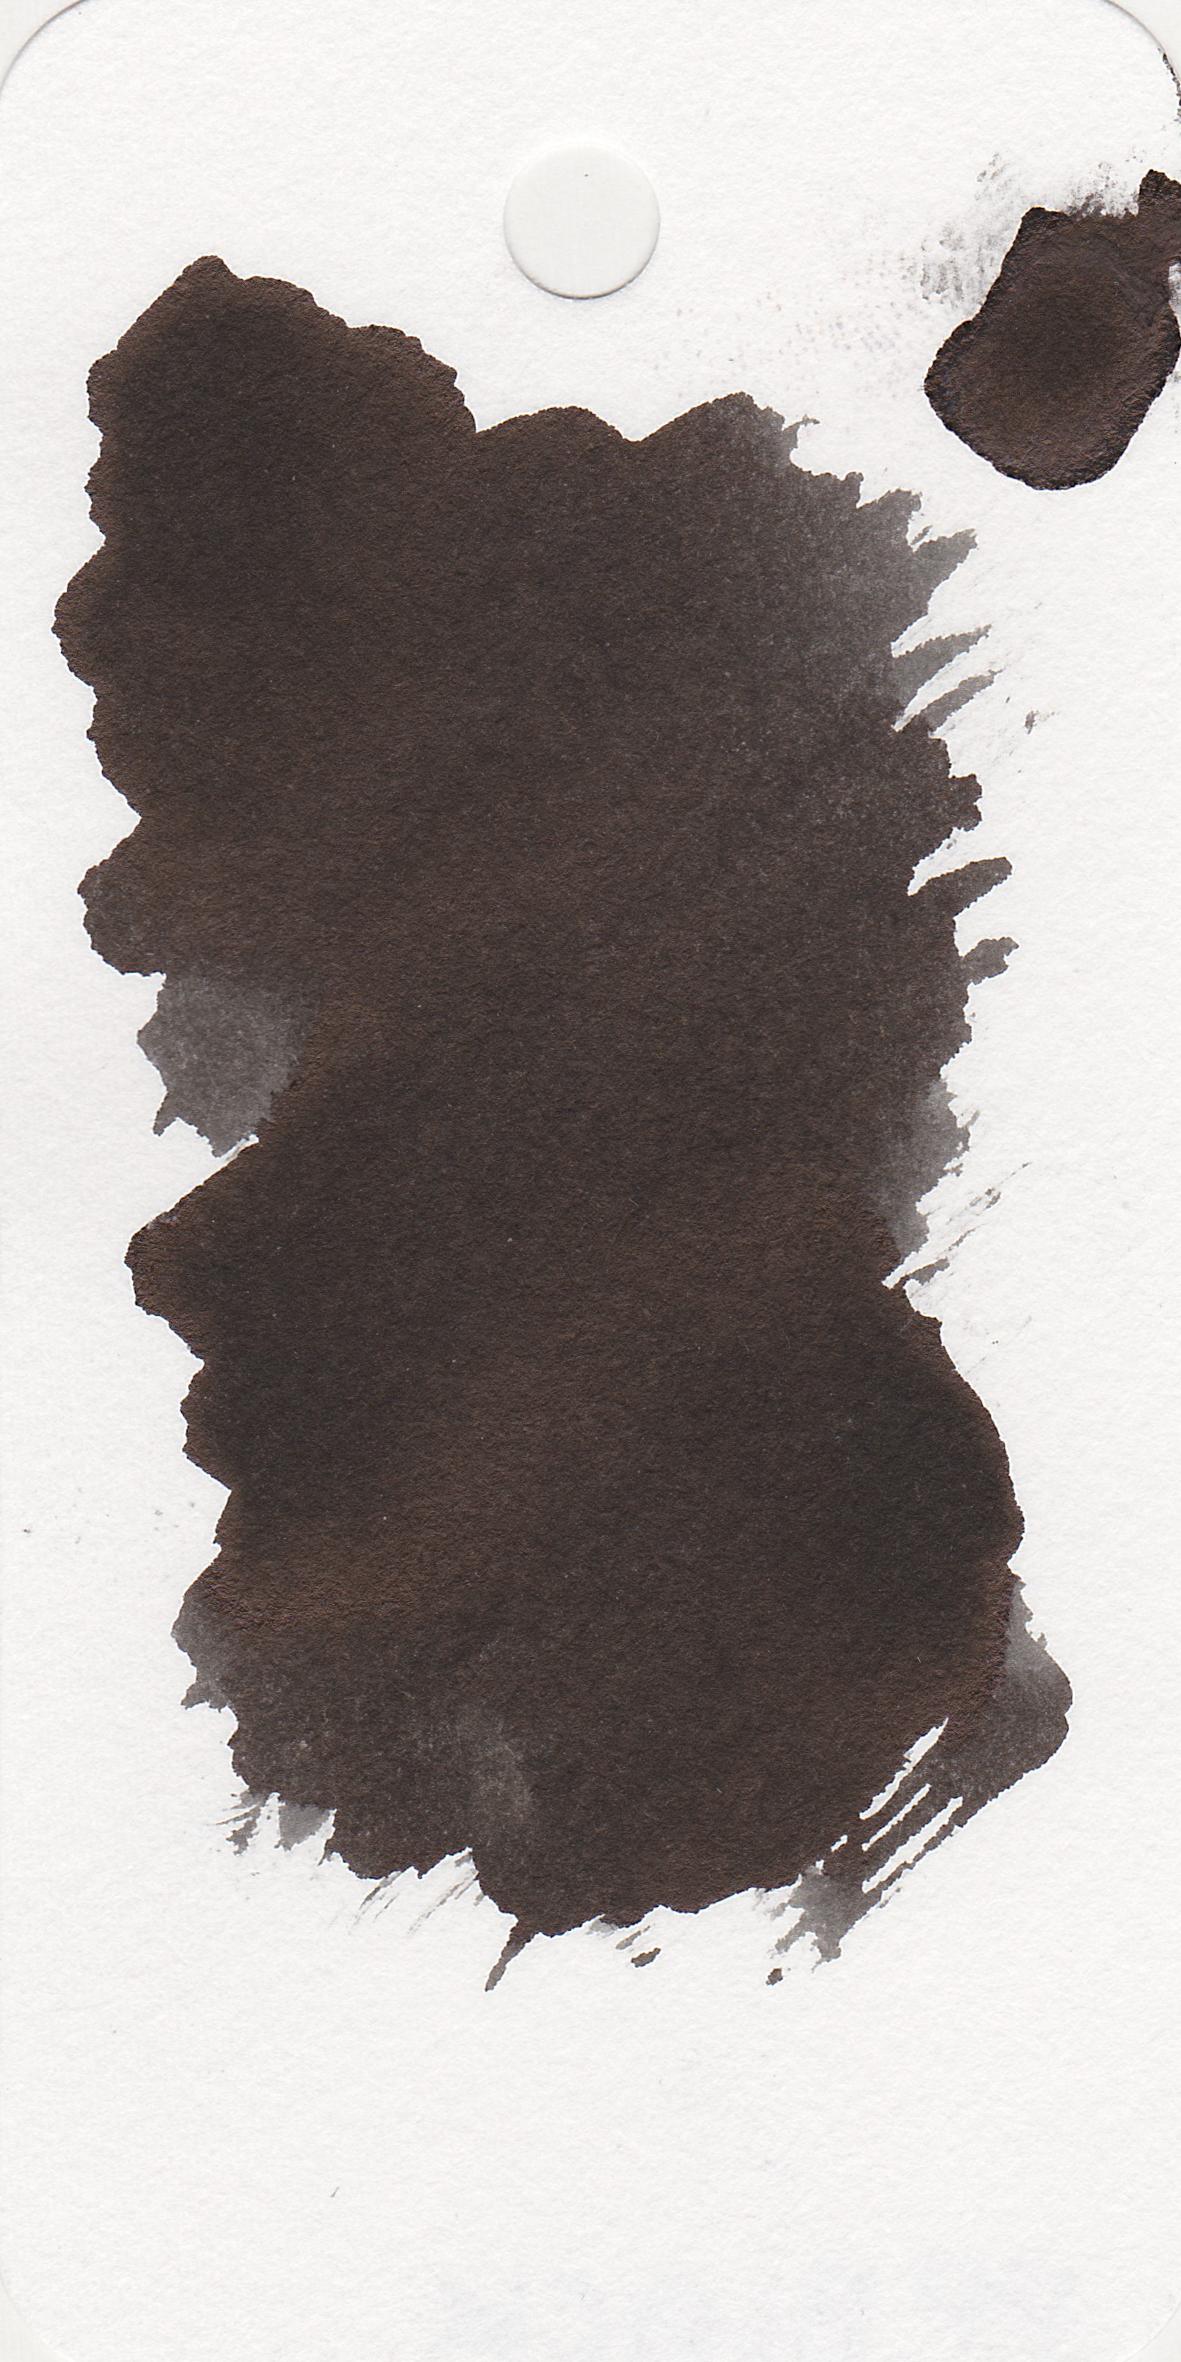 cv-sunspot-2.jpg